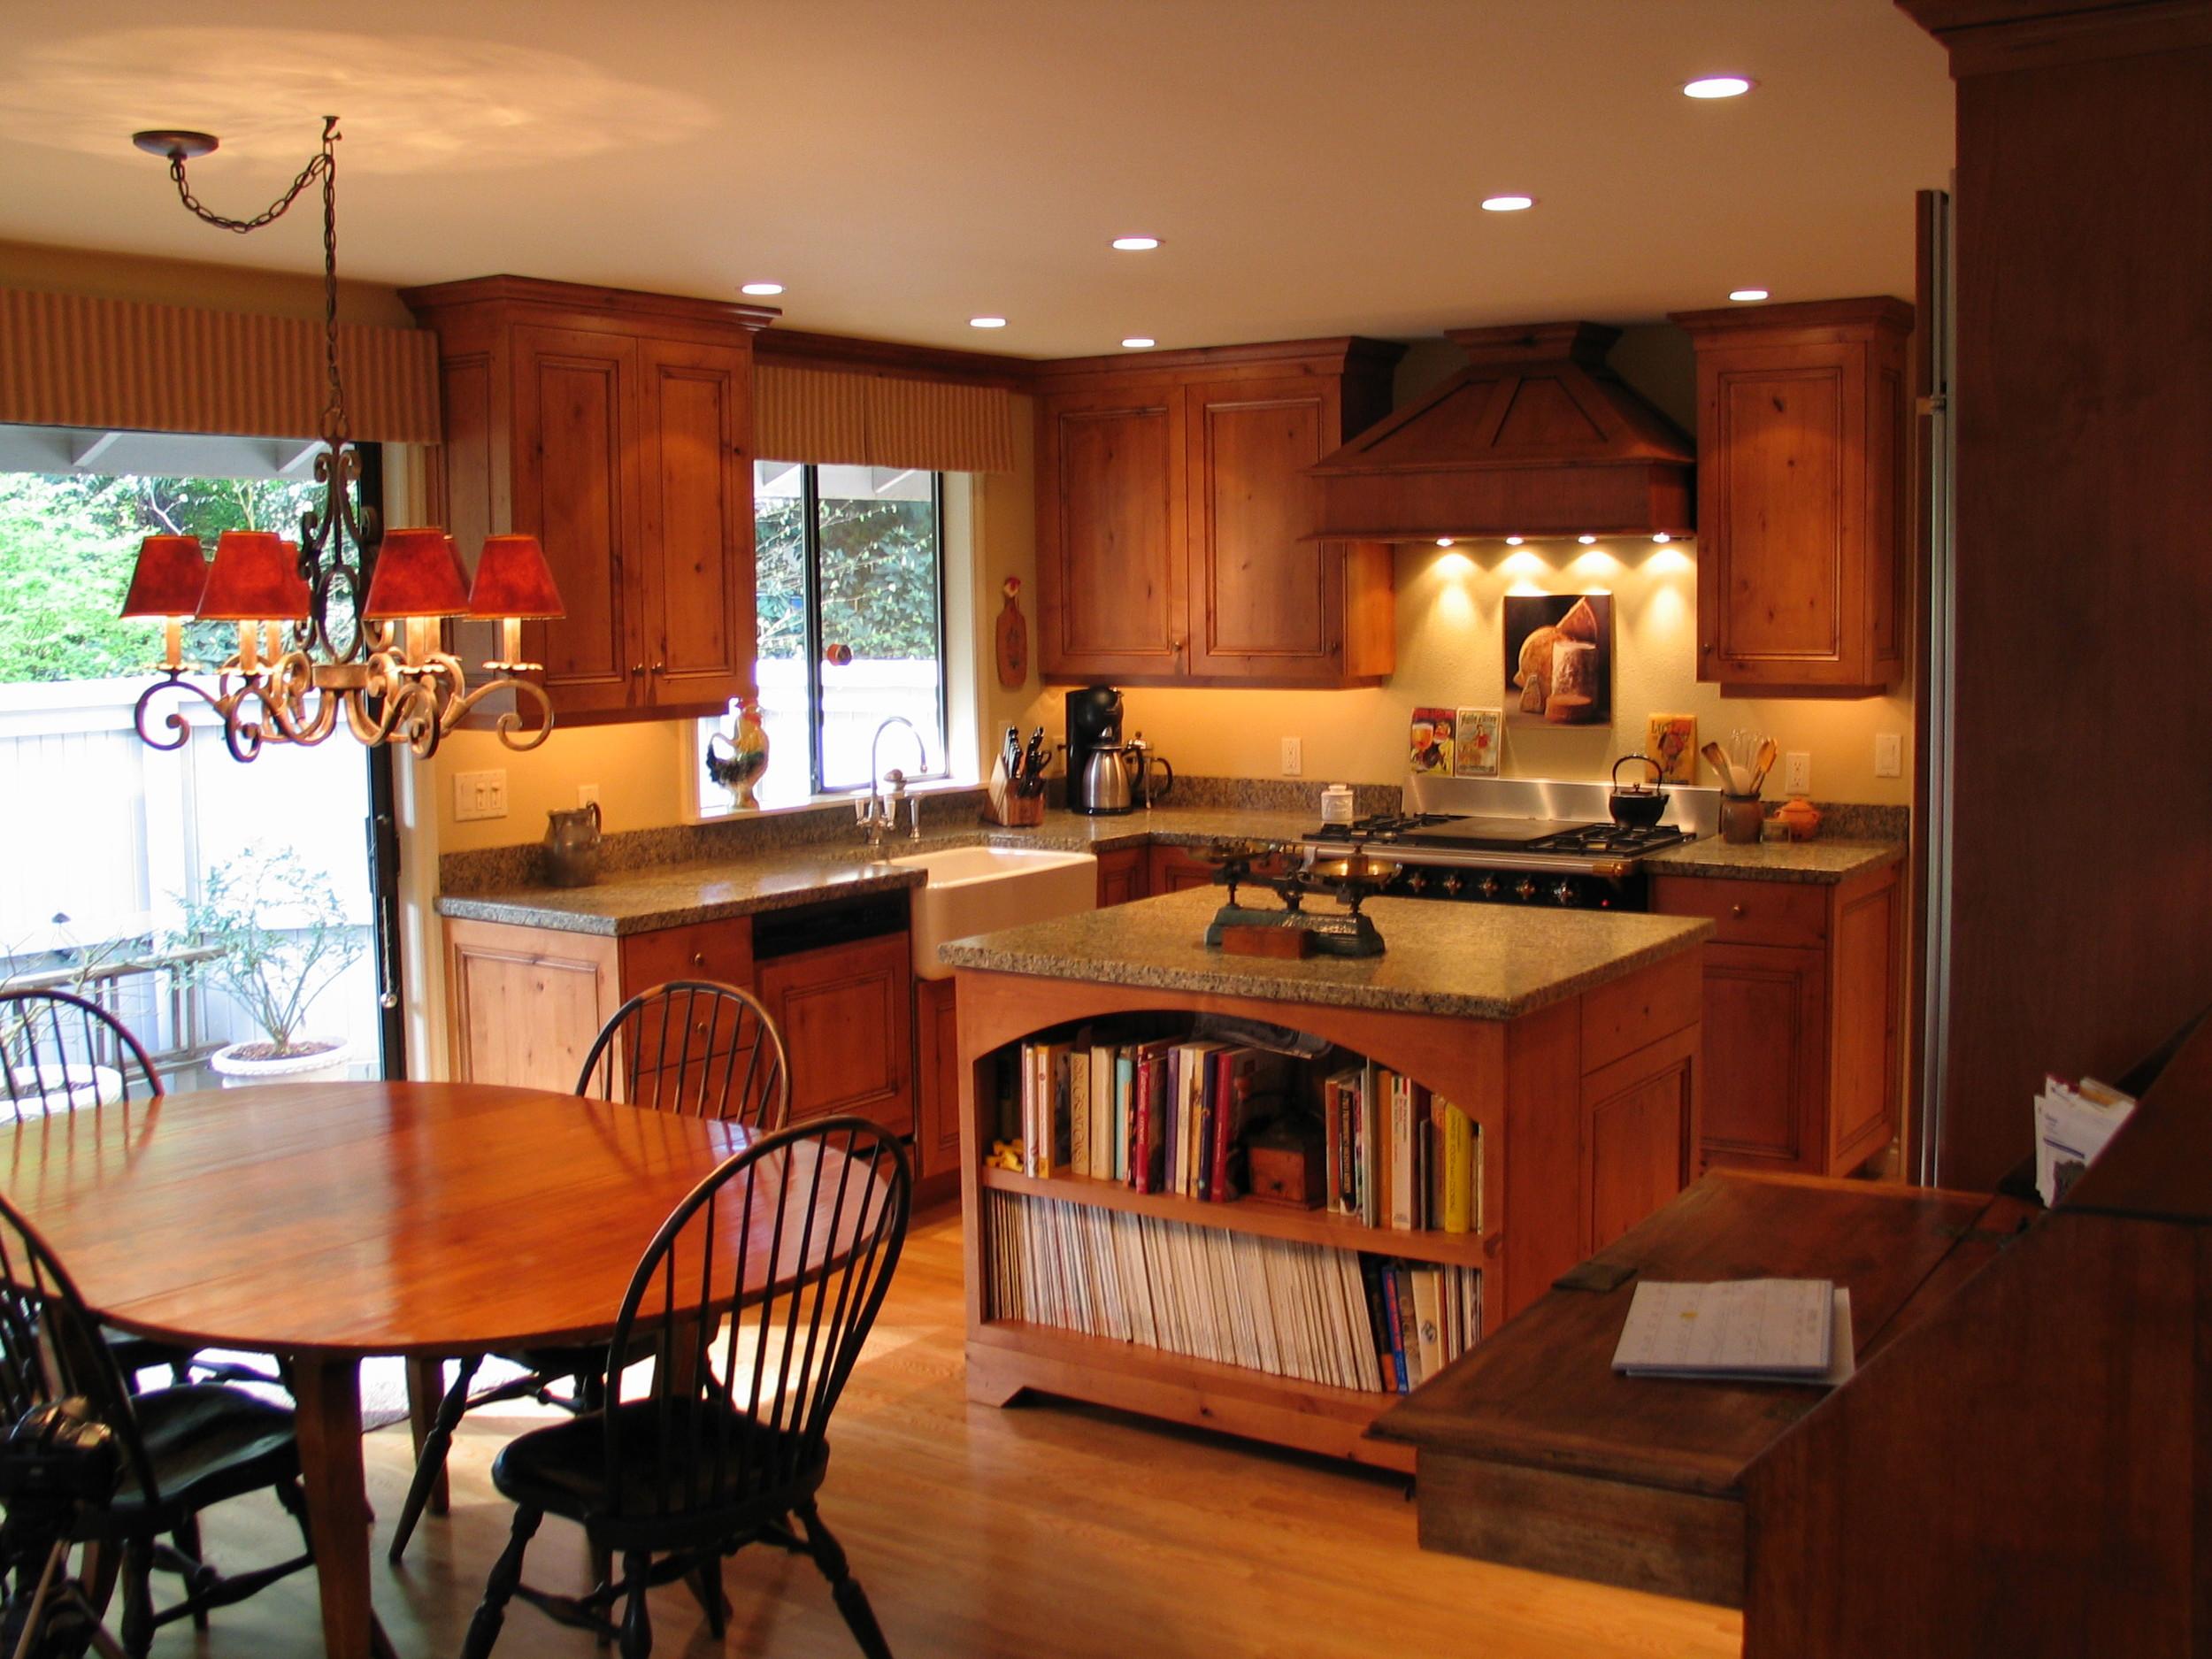 Town house kitchen